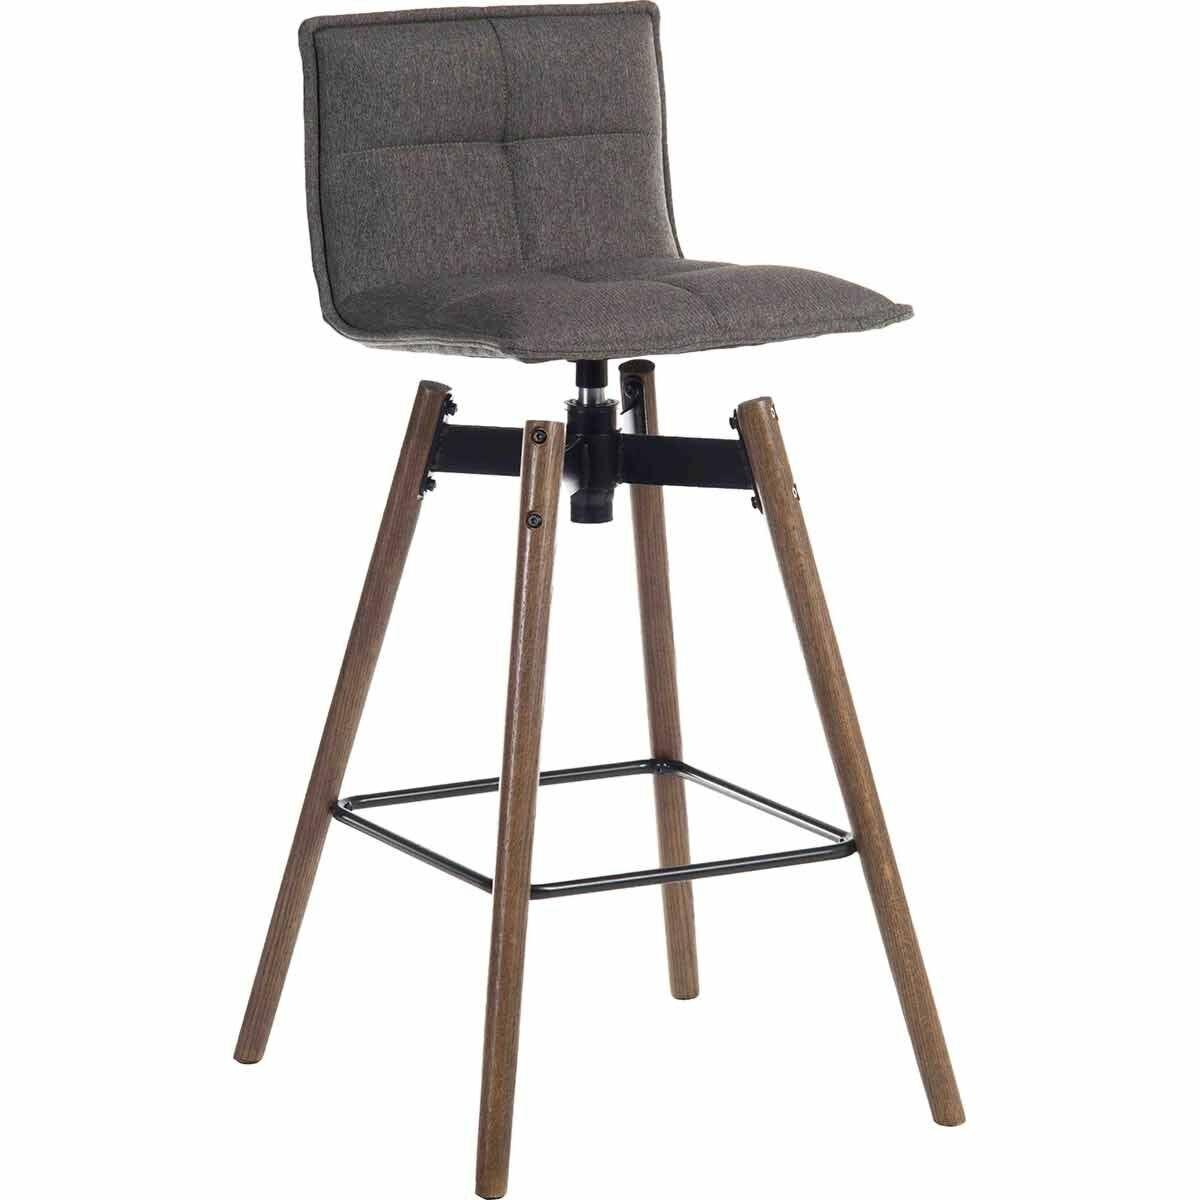 Teknik Office Spin Barstool Grey with Wooden Legs Dark Oak